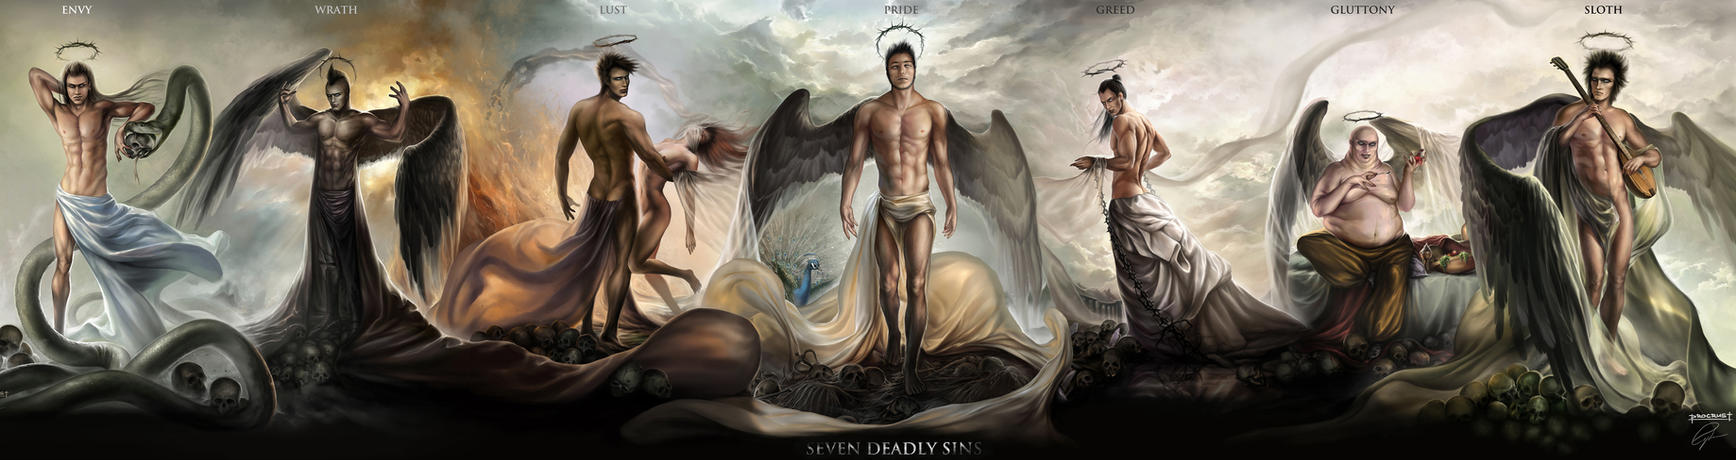 http://th04.deviantart.net/fs70/PRE/f/2012/035/4/5/seven_deadly_sins_by_procrust-d4olpqe.jpg